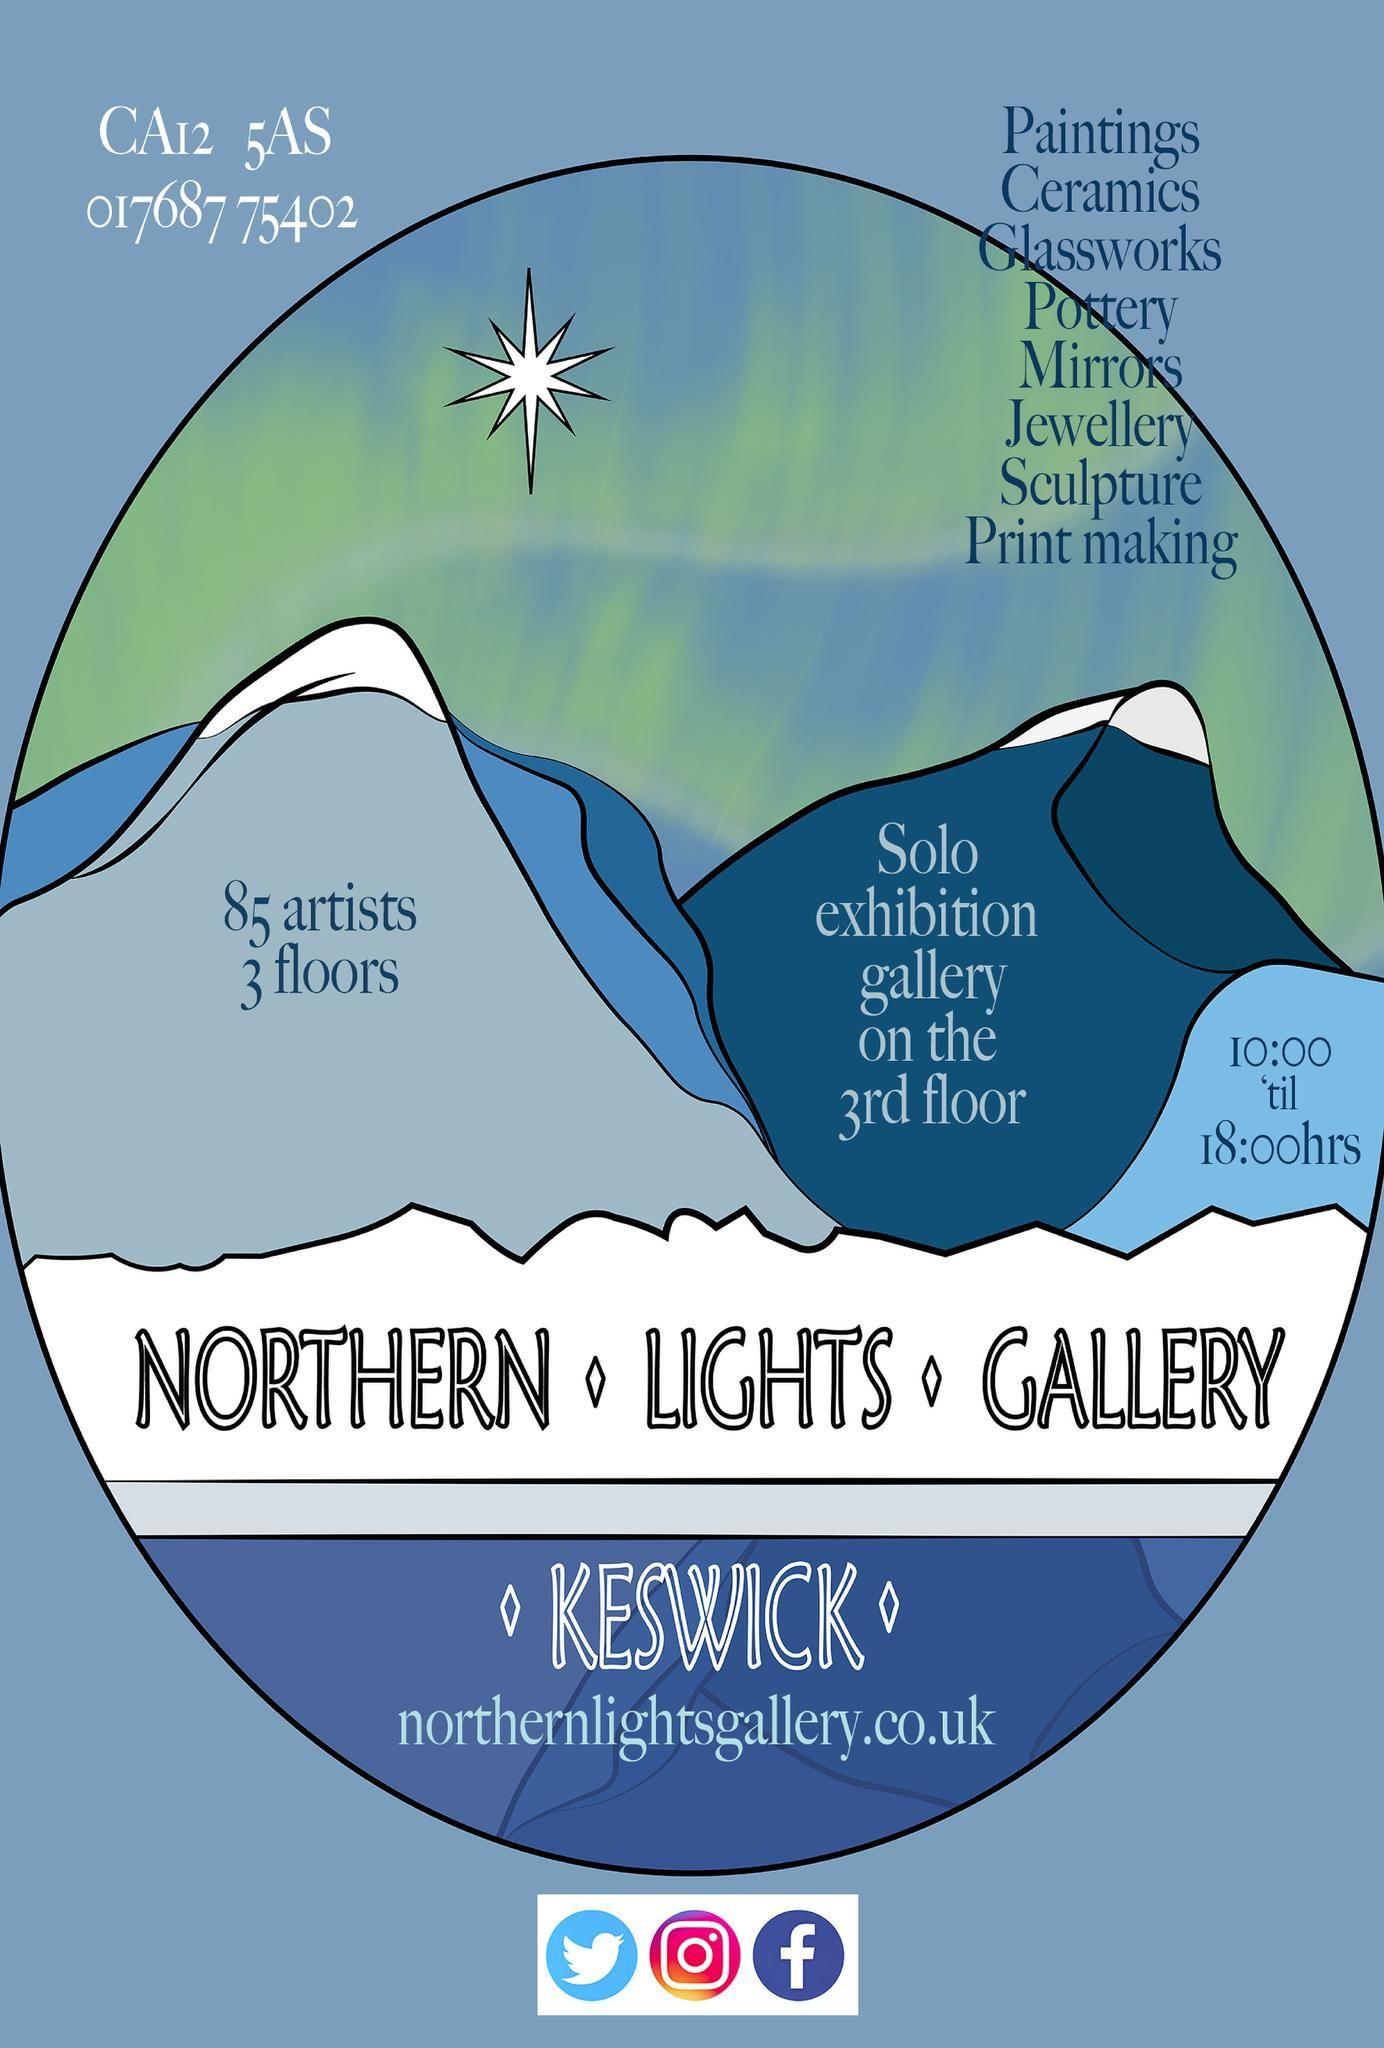 Northern Lights Gallery